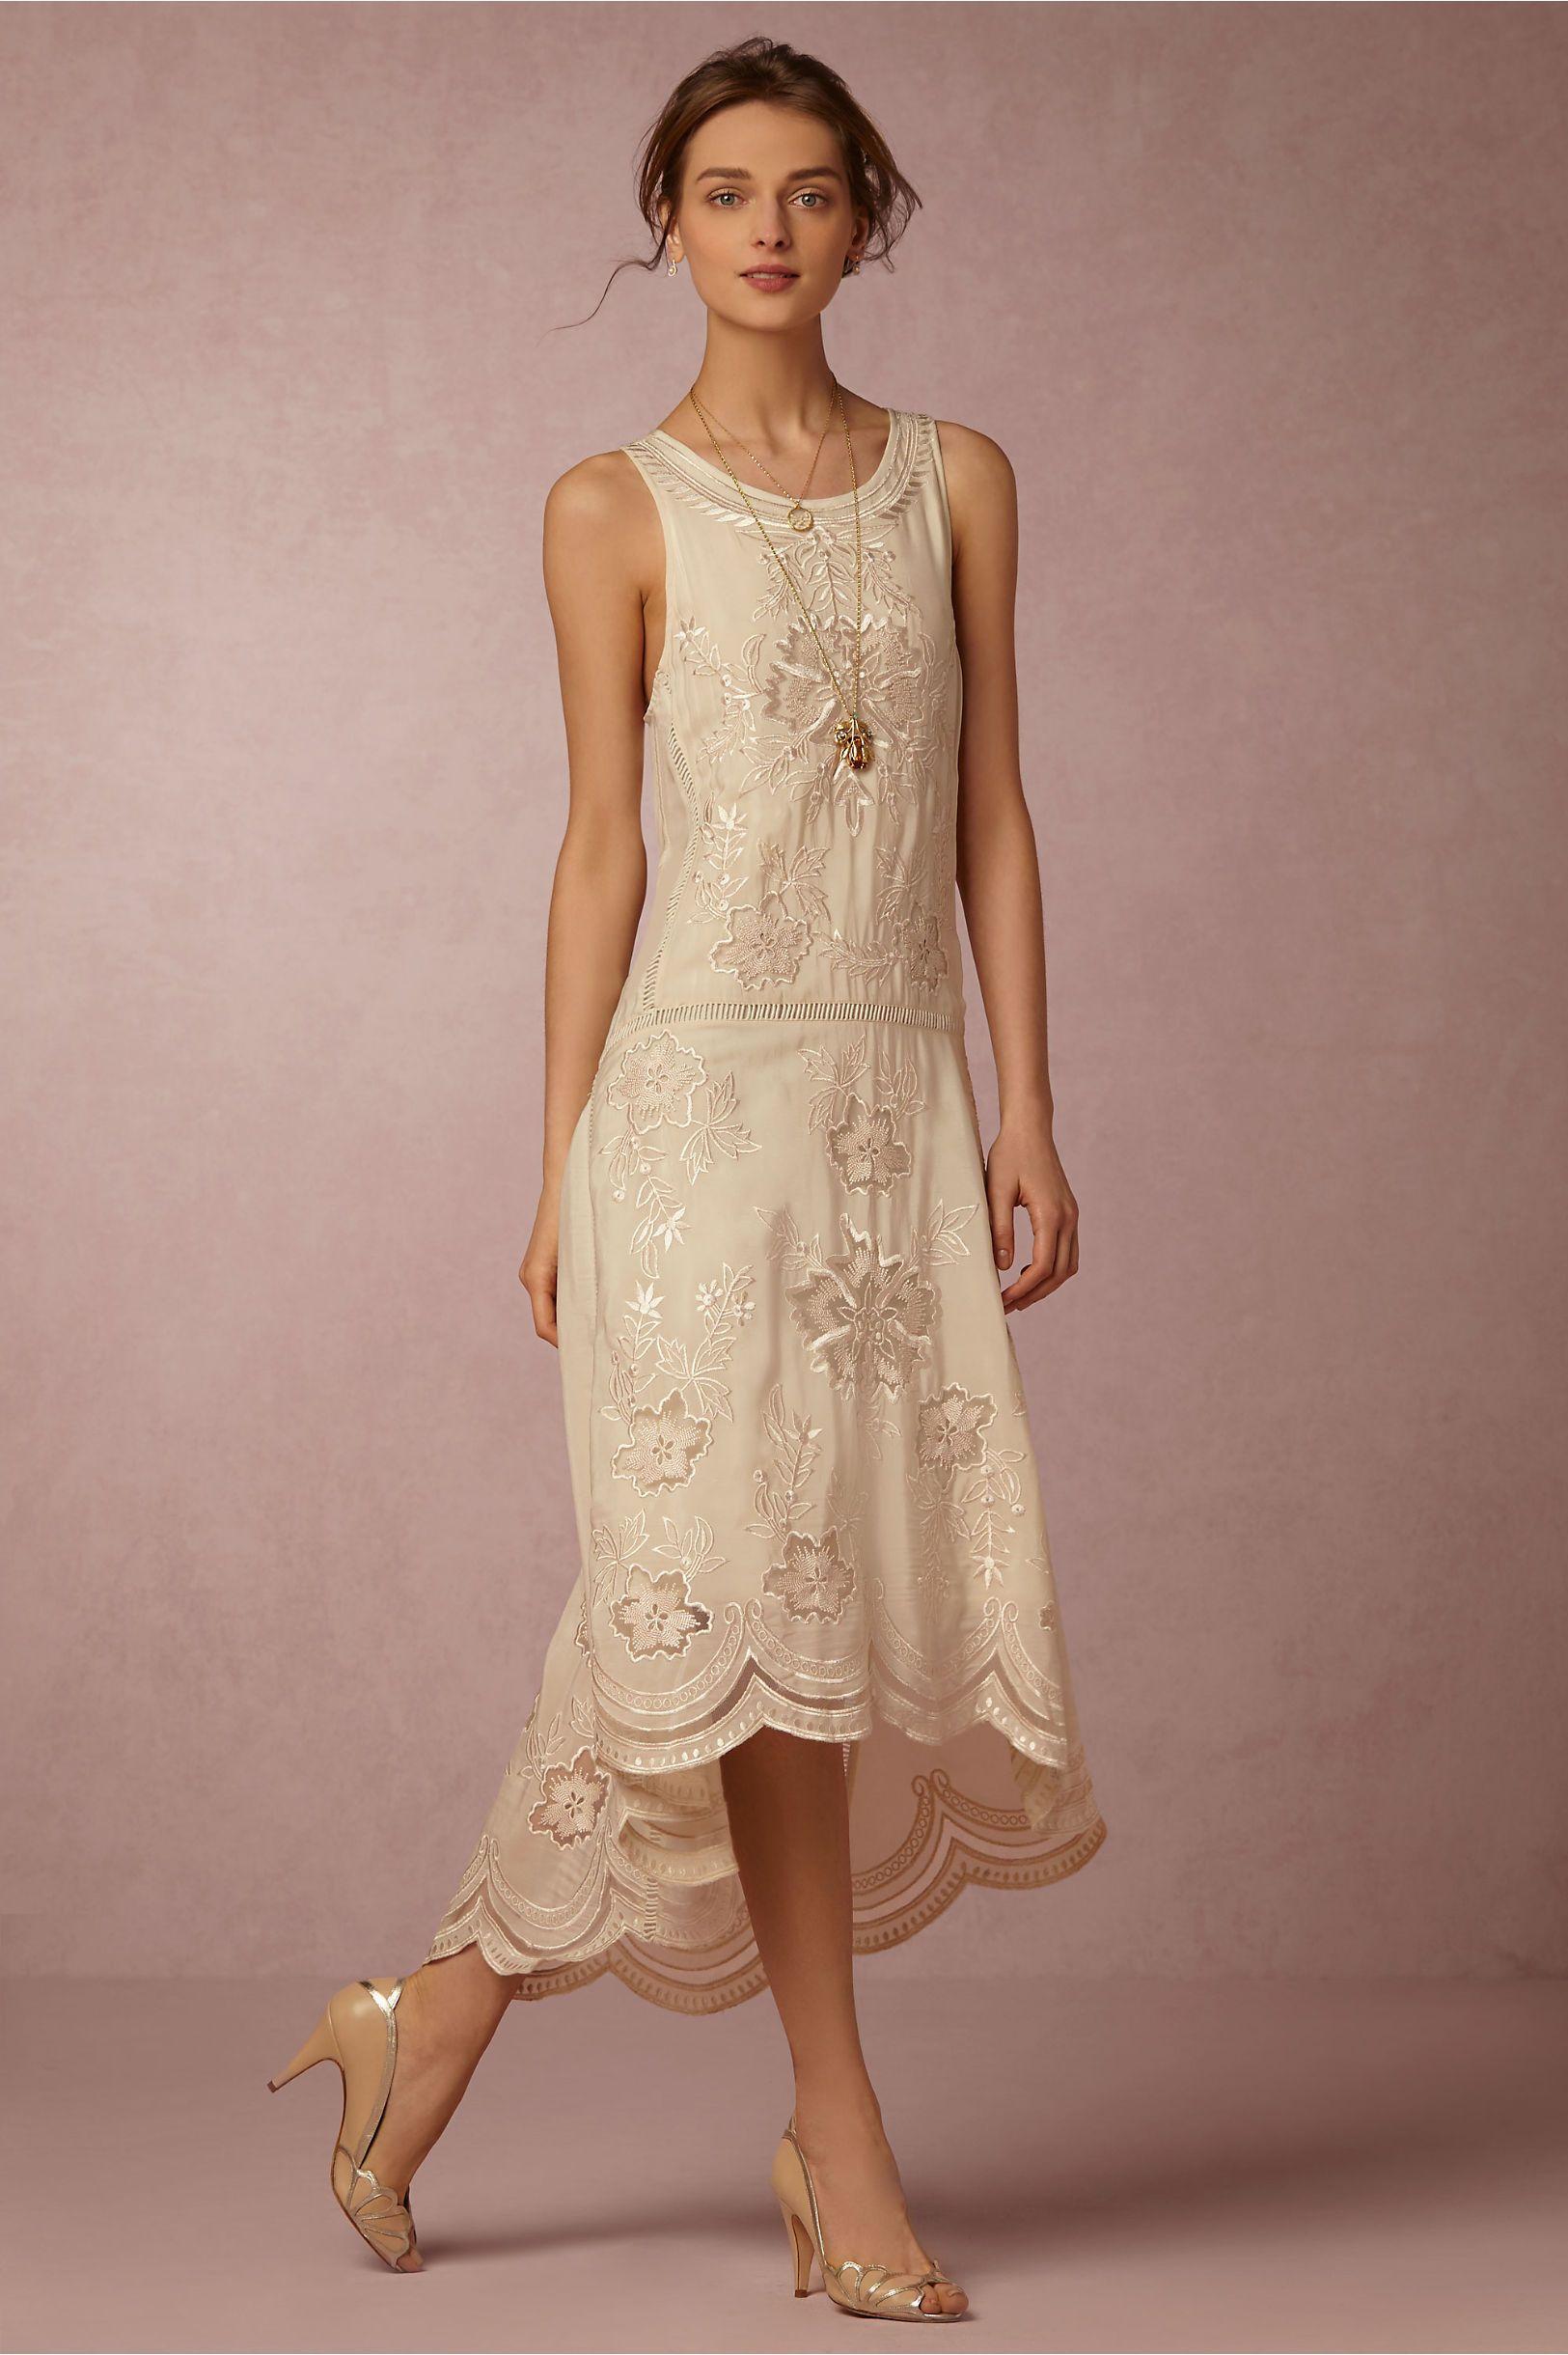 Cora Dress in New at BHLDN | Dresses | Pinterest